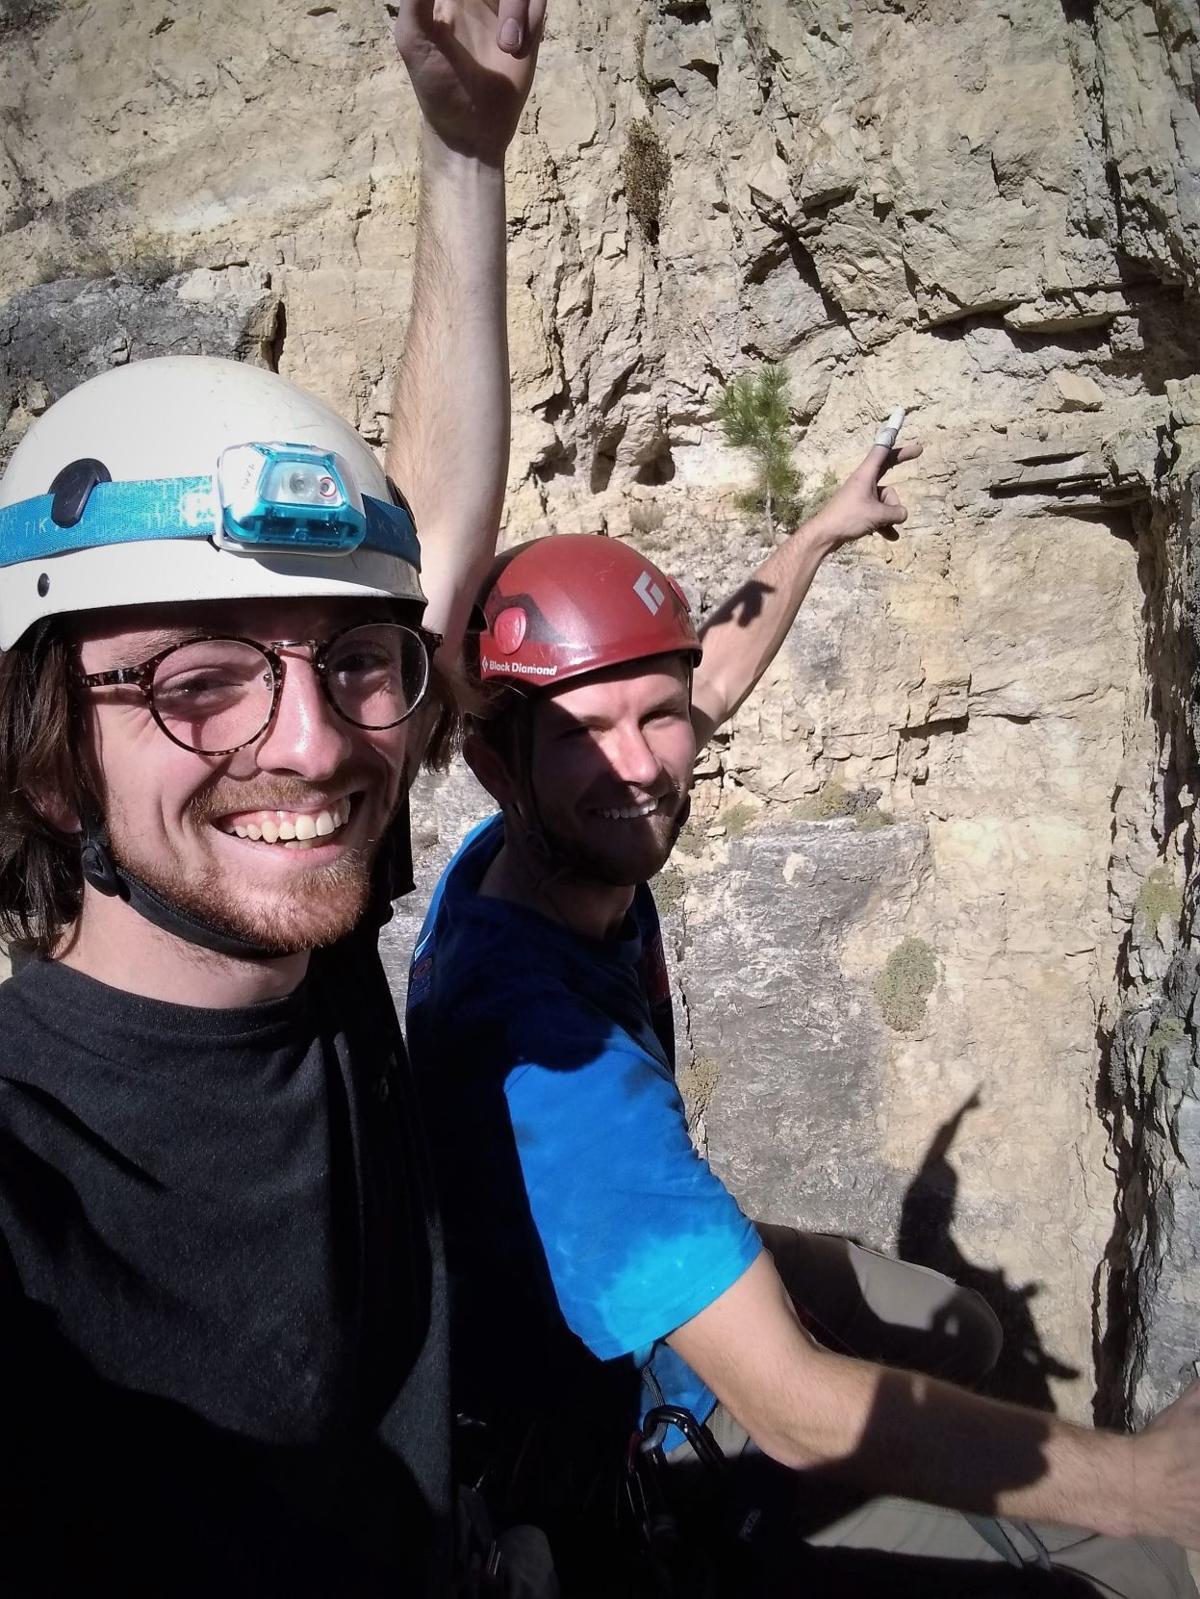 110818-nh-climbers001.jpg